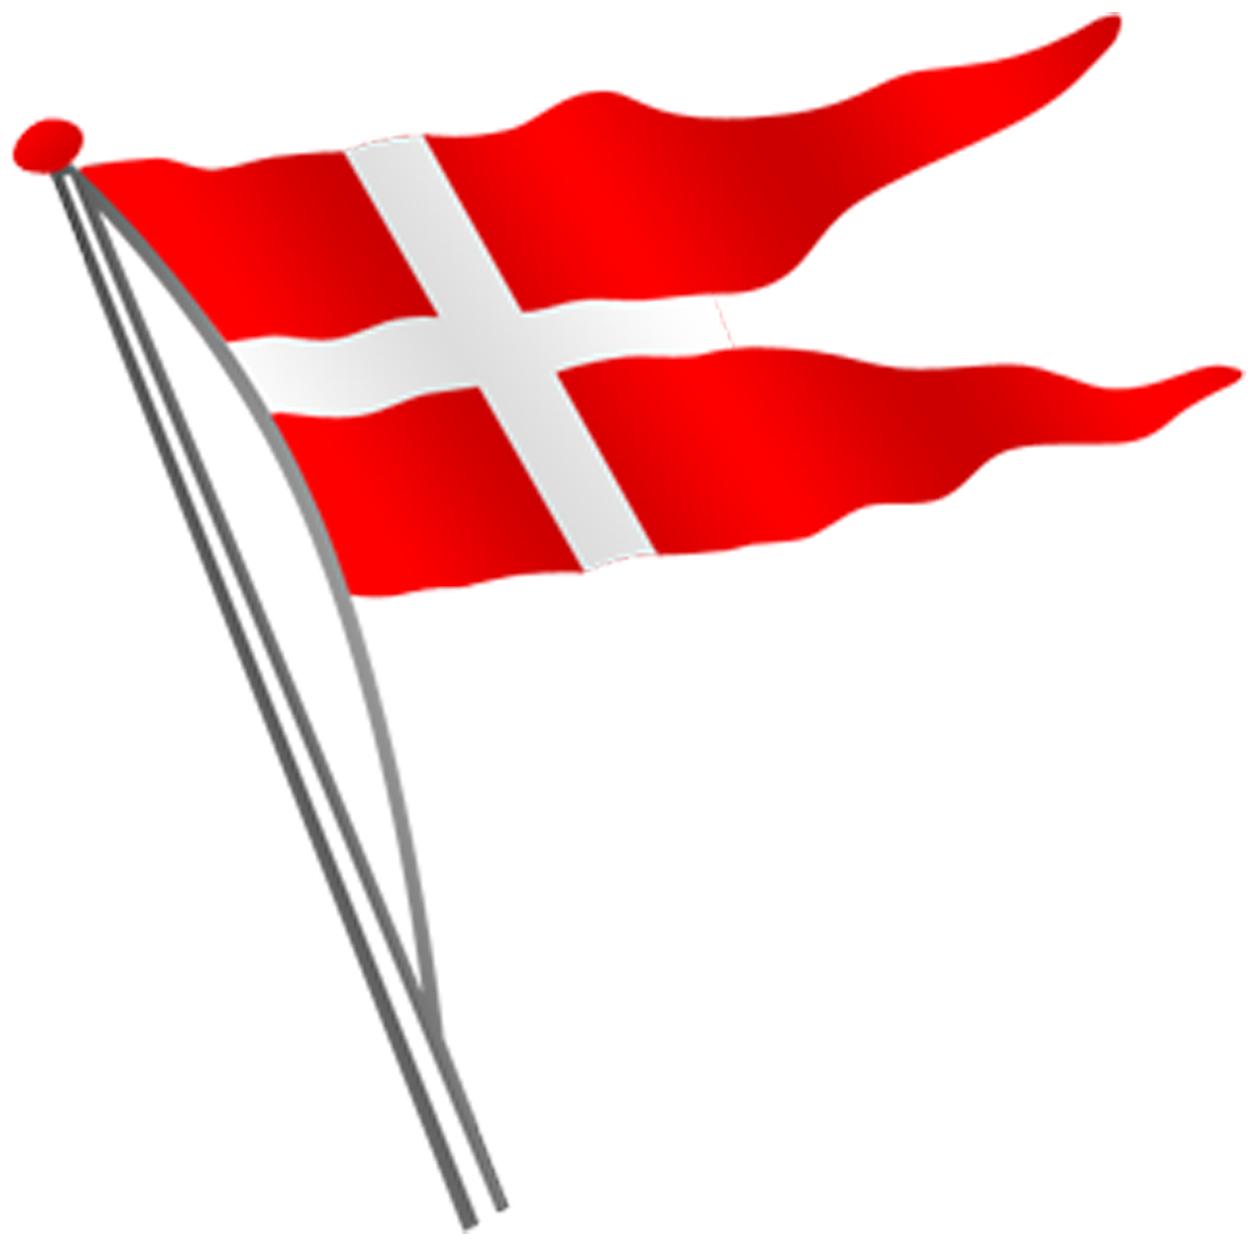 Dannebrog Flag Clipart.